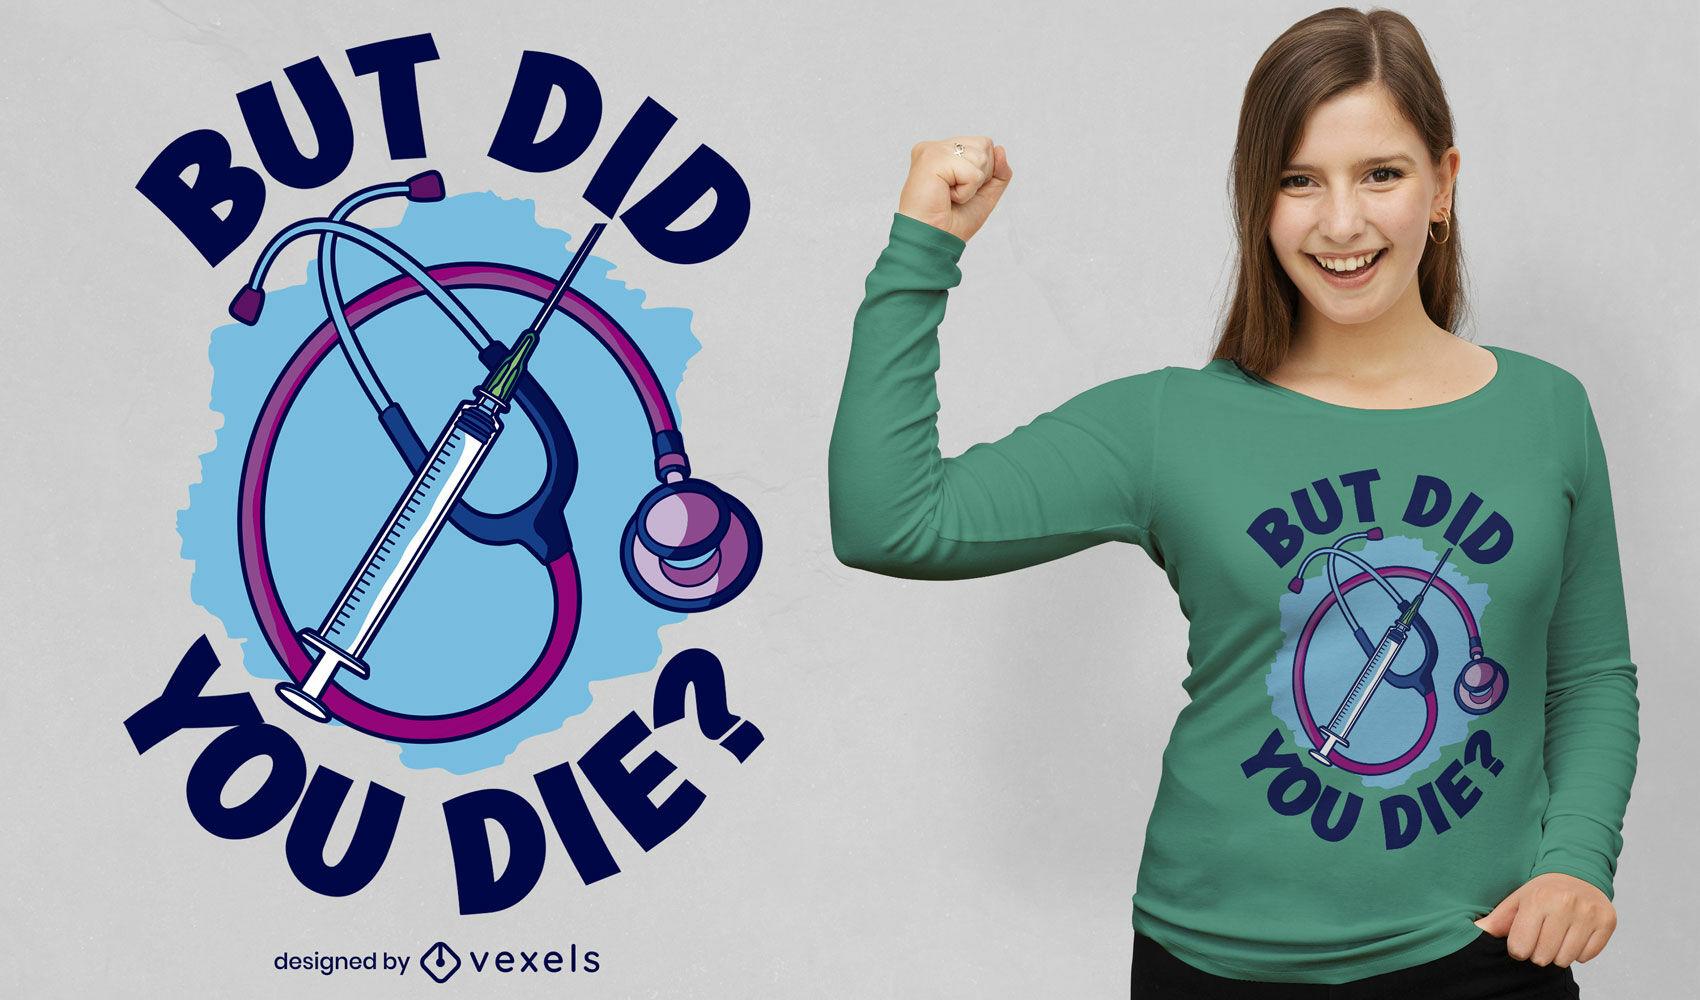 Dise?o de camiseta de doctor en medicina de jeringa